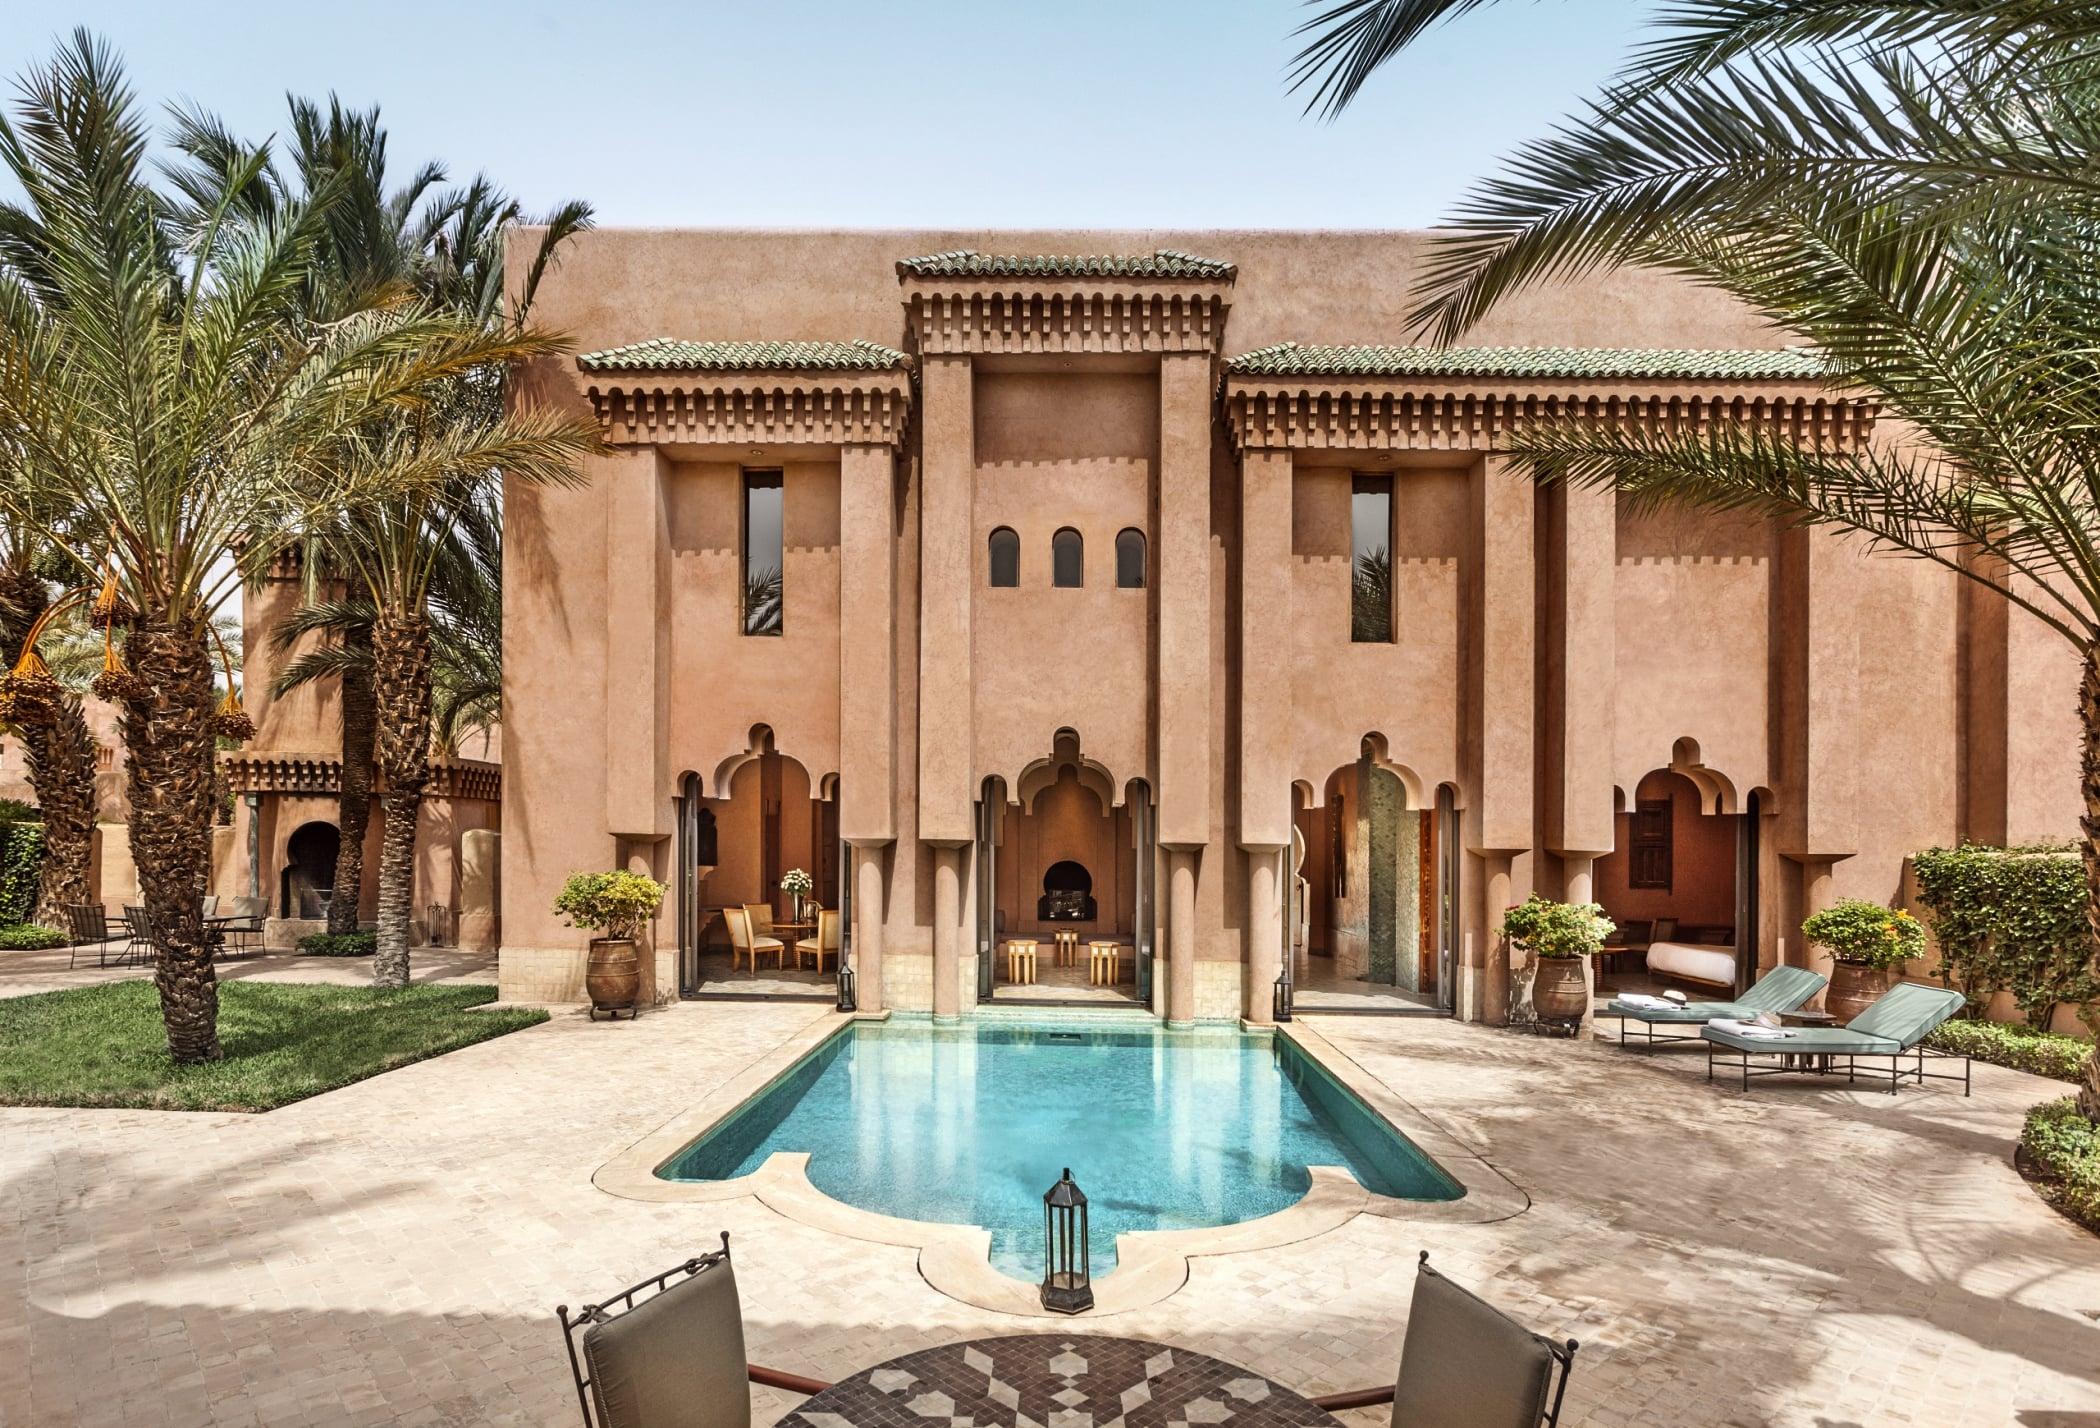 Amanjena_Morocco_Marrakech_Maison_Jardin_fivestardestination_five_star_destination_8